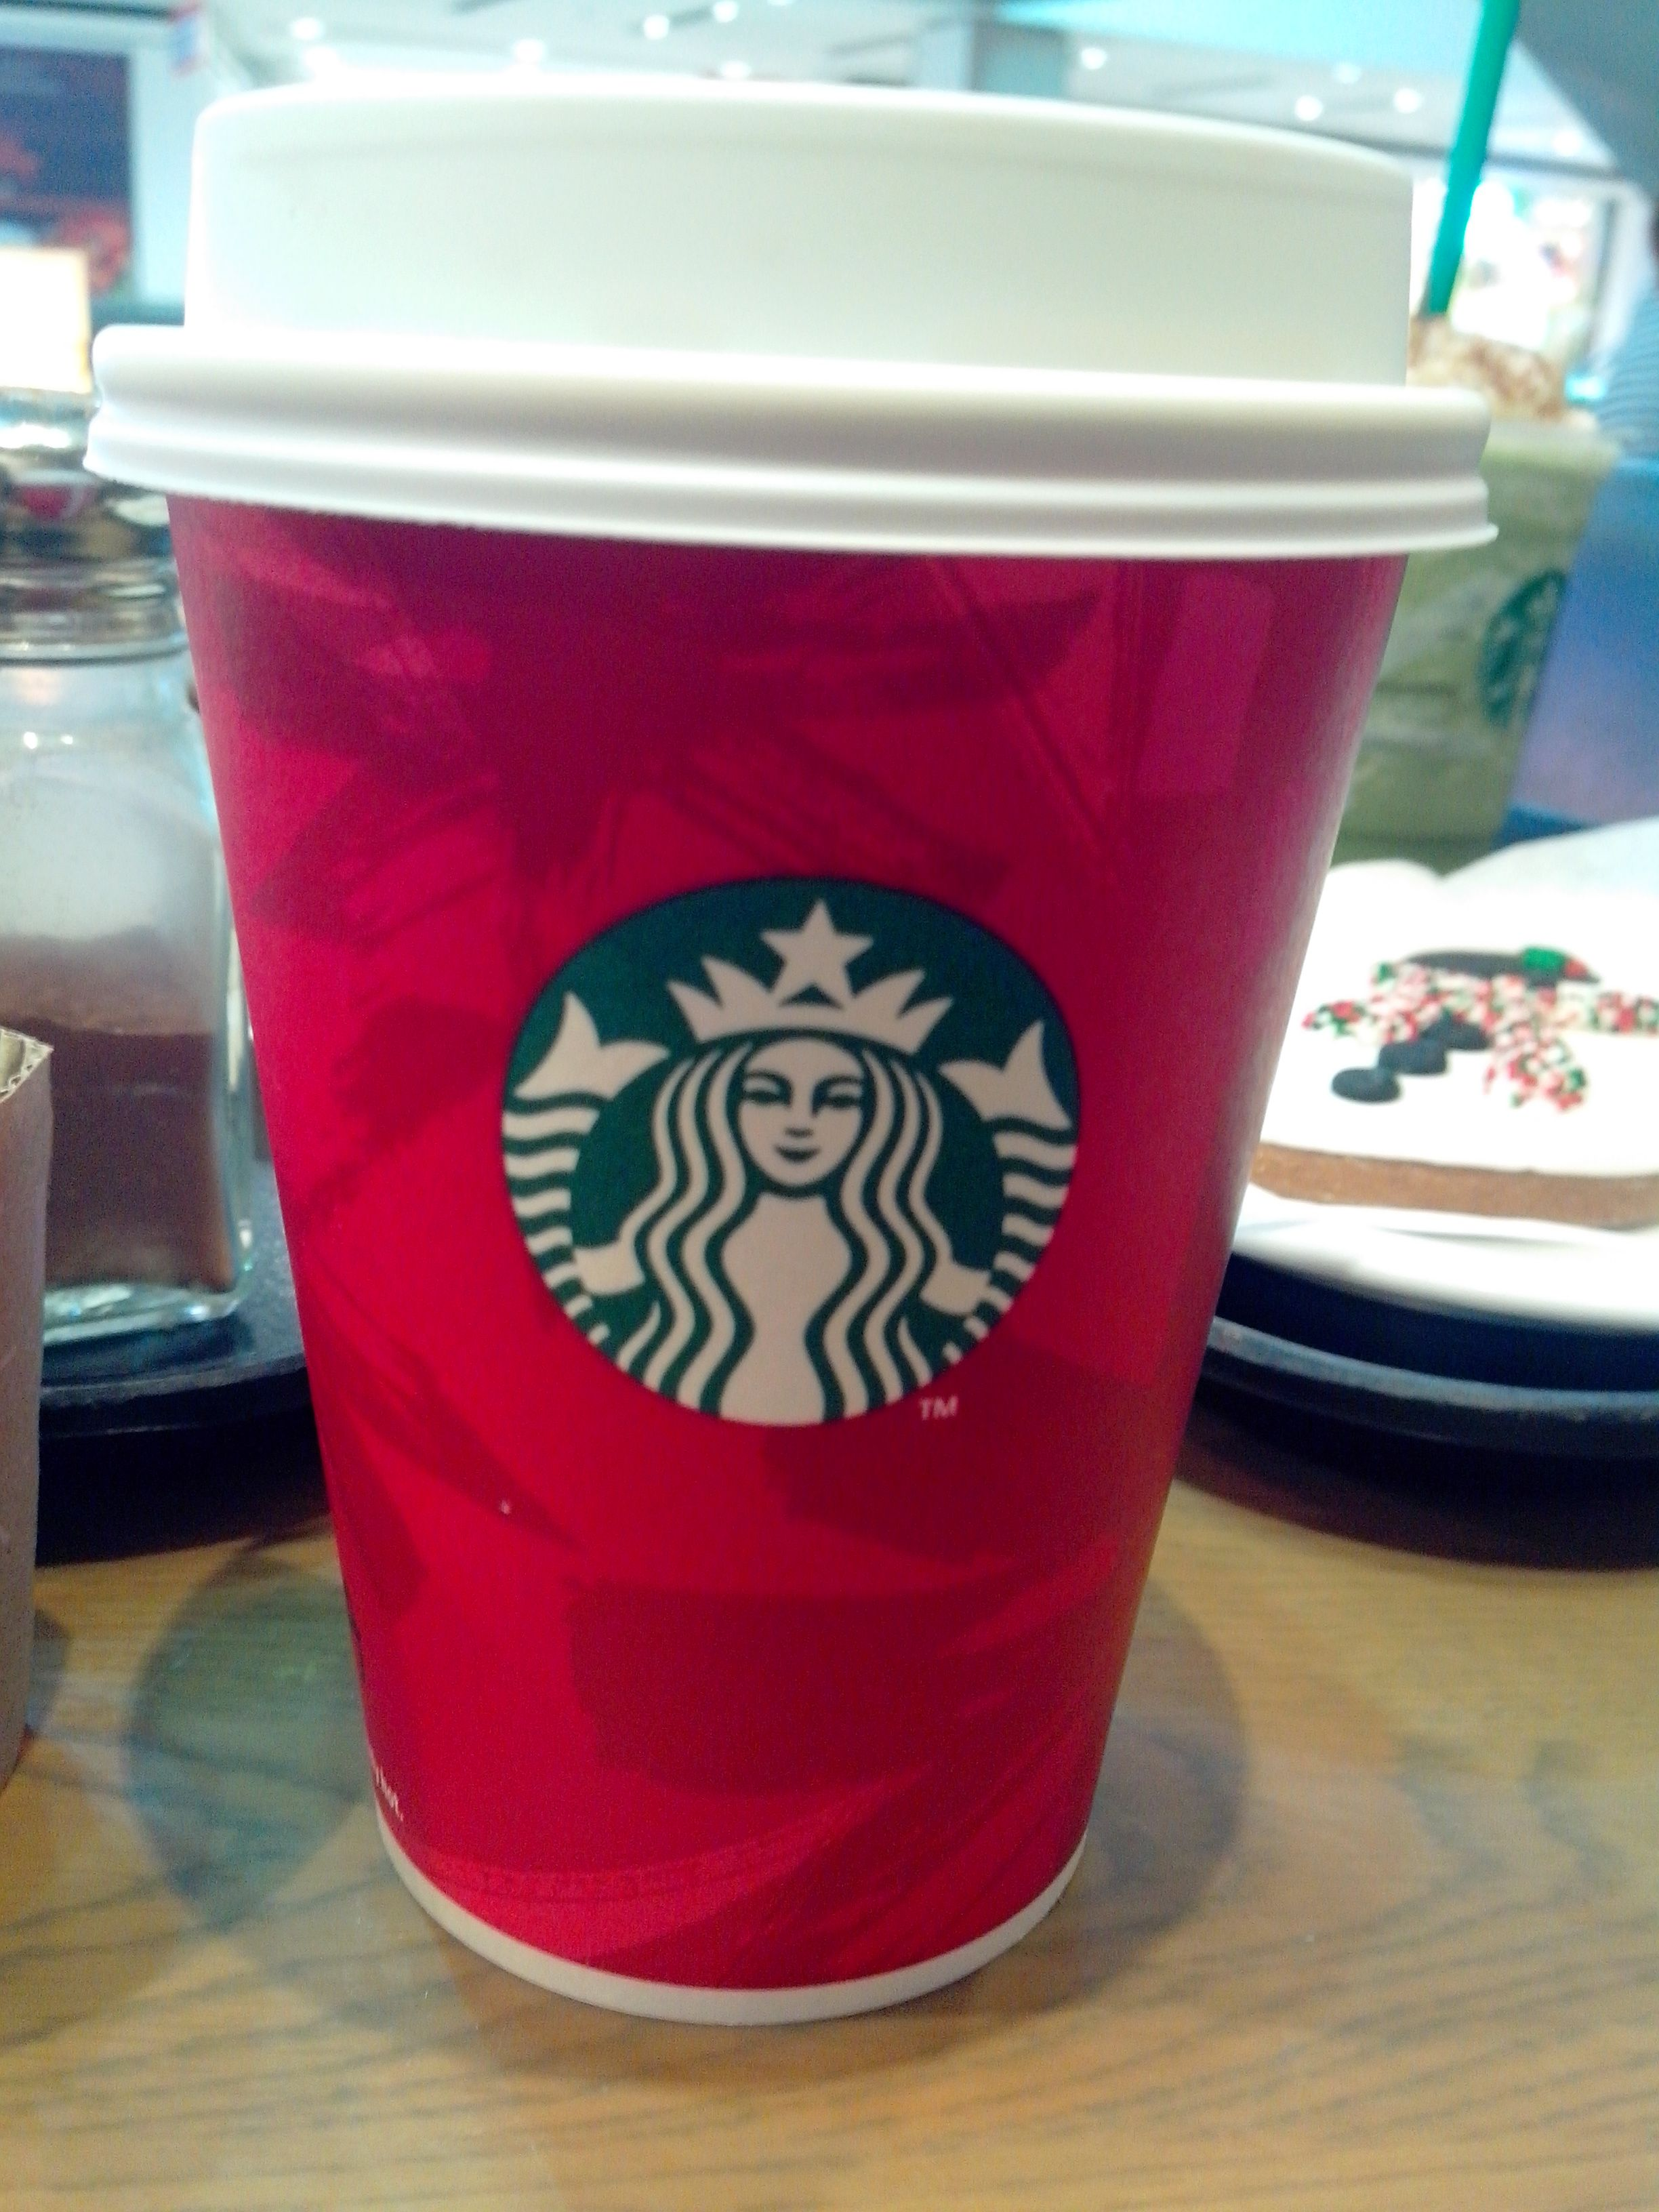 merry christmas from starbucks - Starbucks Merry Christmas